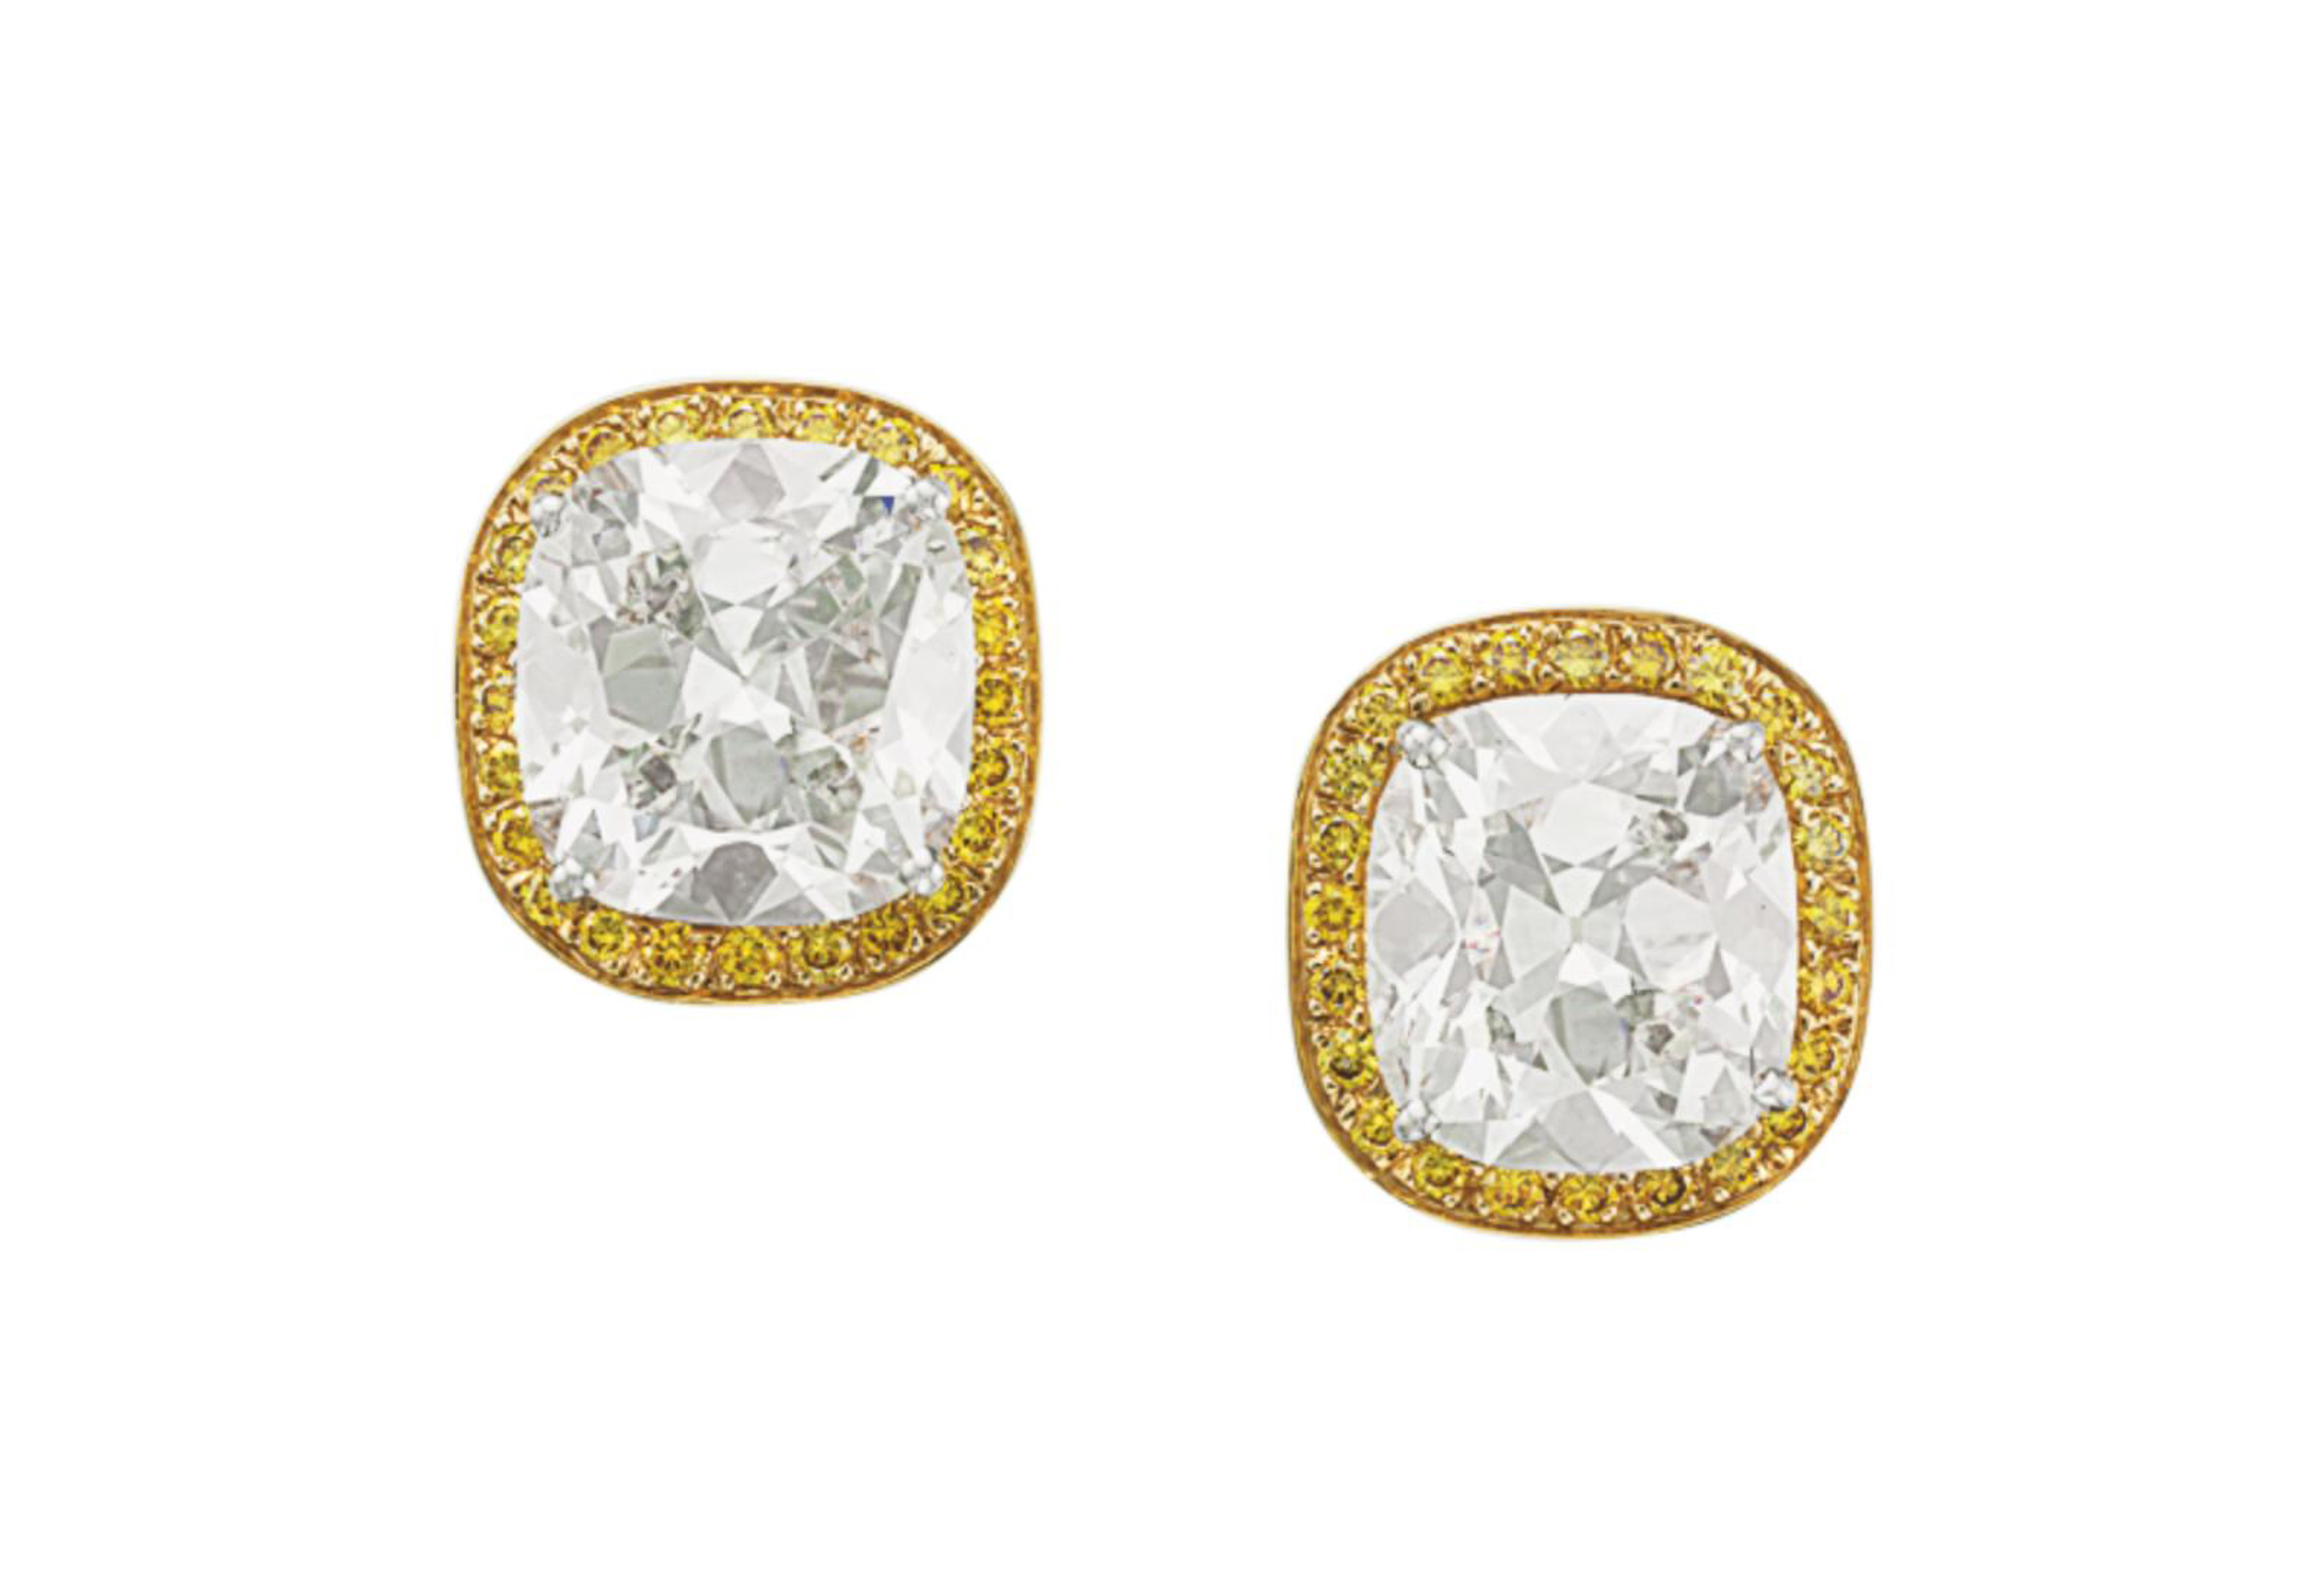 A PAIR OF DIAMOND AND COLORED DIAMOND EAR CLIPS, BY OSCAR HEYMAN & BROTHERS